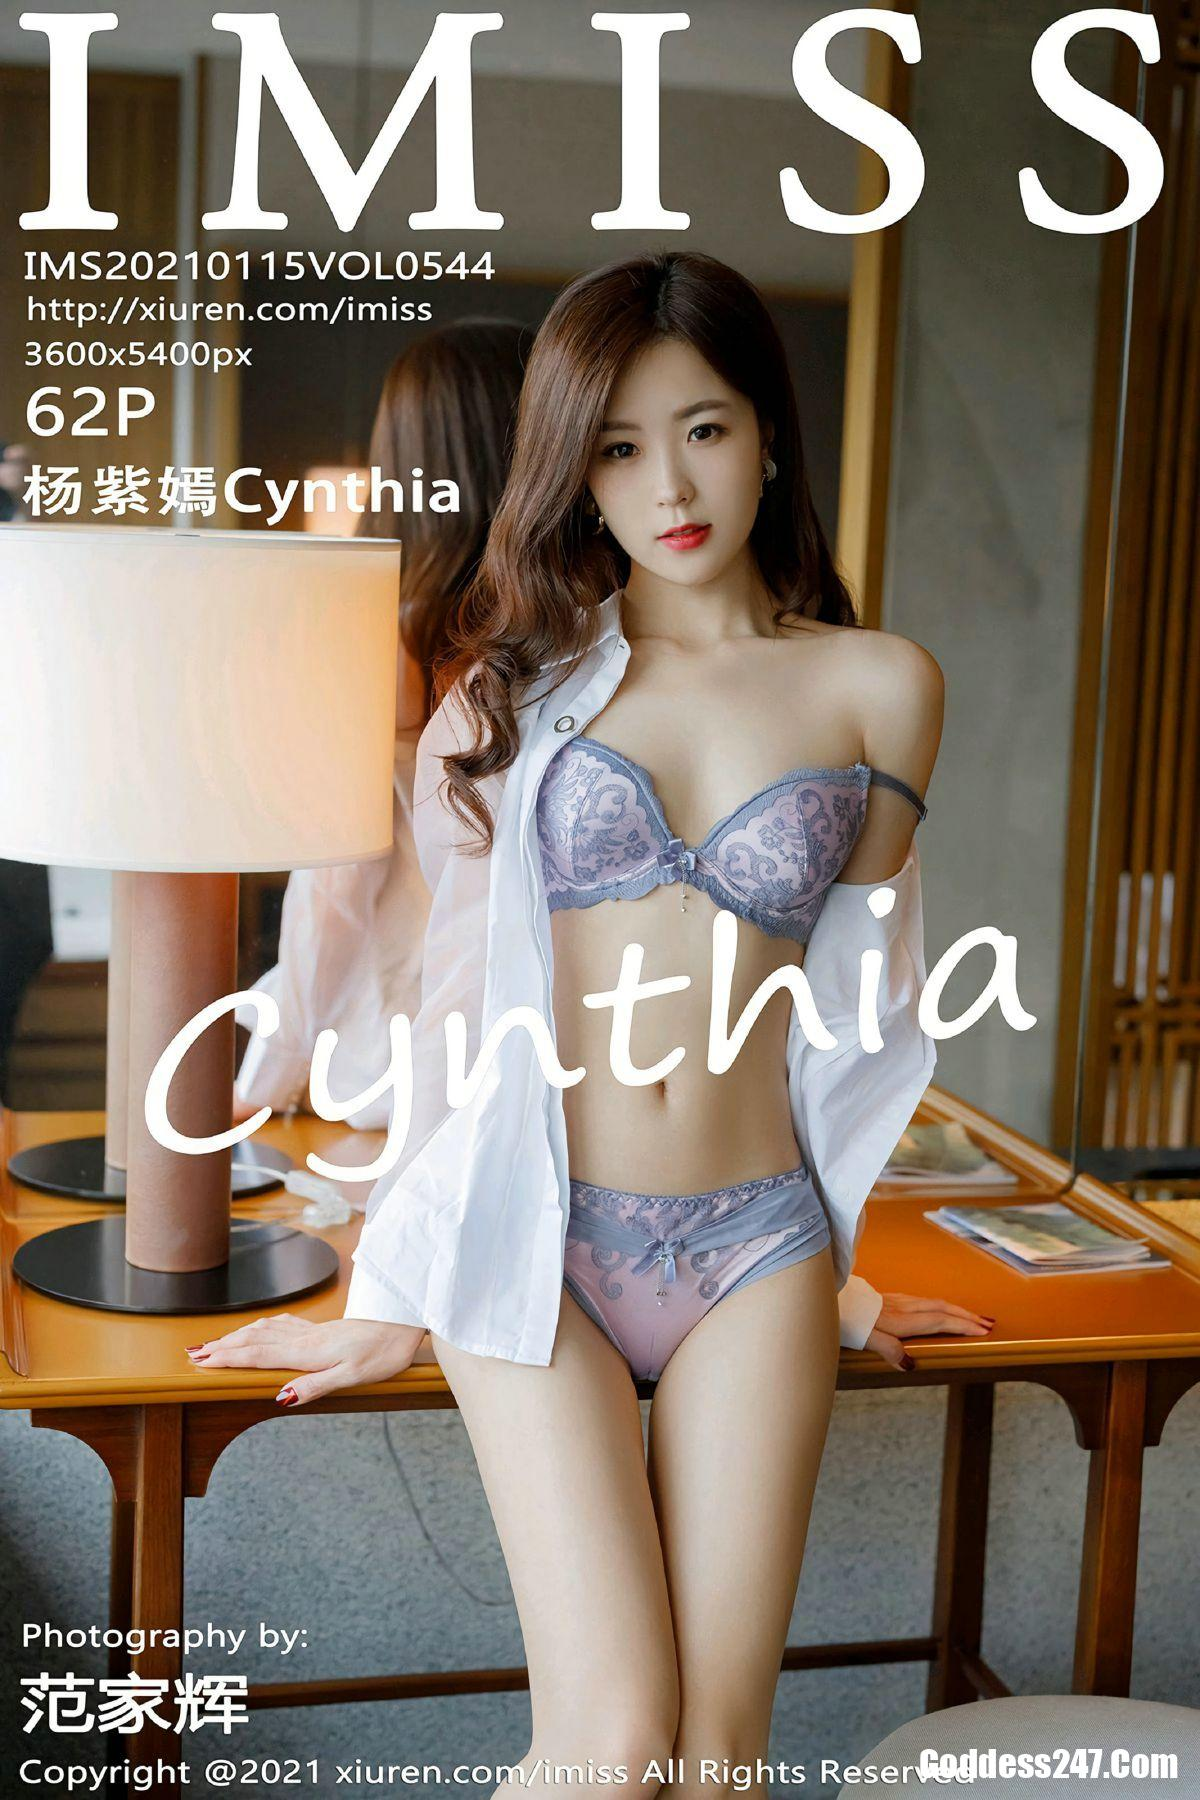 IMiss爱蜜社 Vol.544 杨紫嫣Cynthia